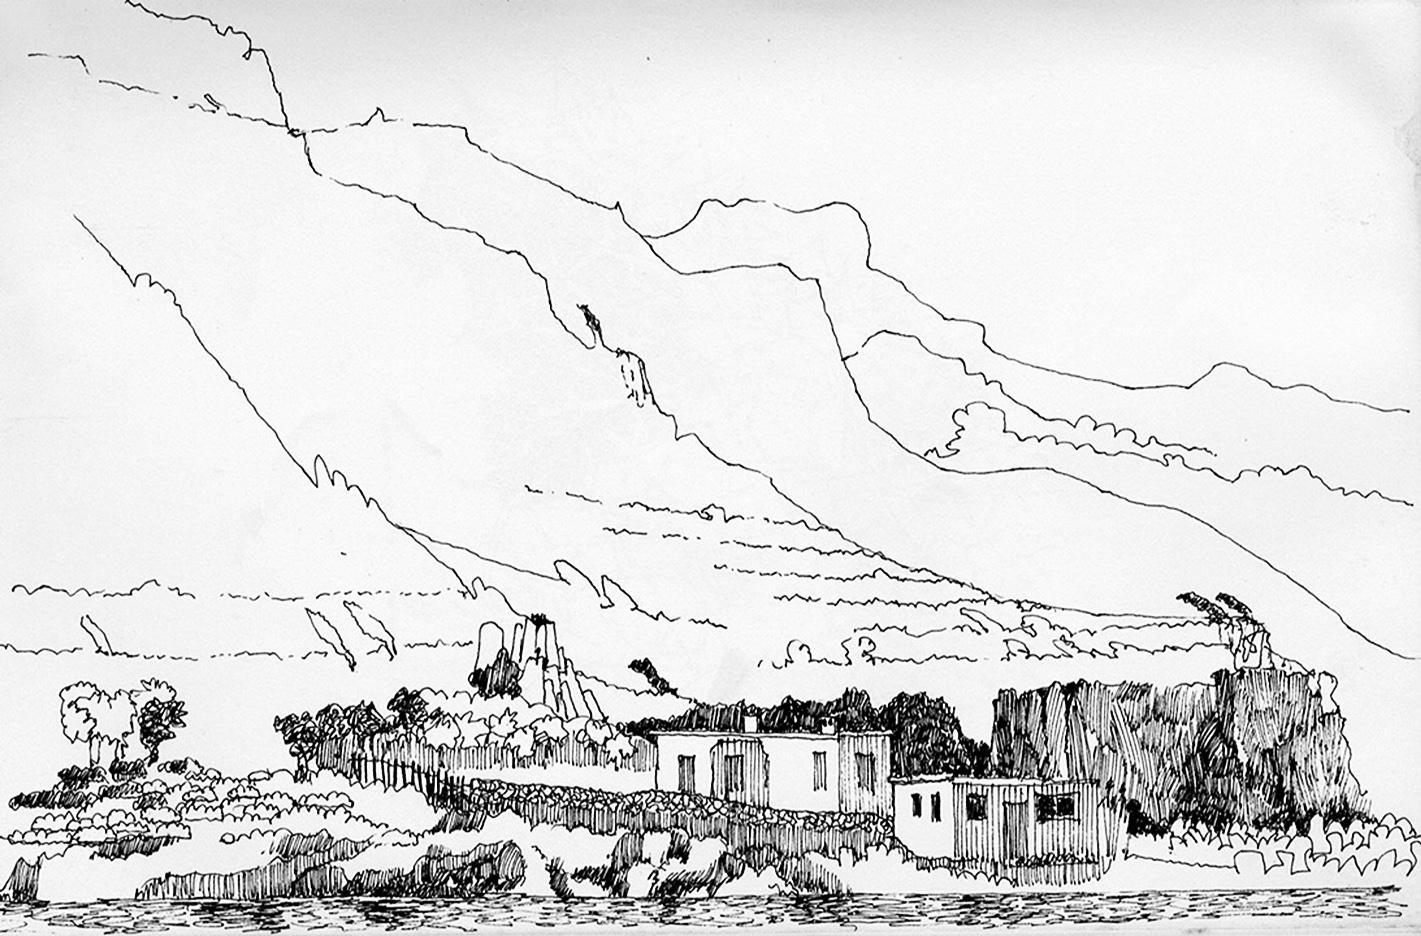 Jeff Soan's Ikaria 1974 – Ayia Kiriaki